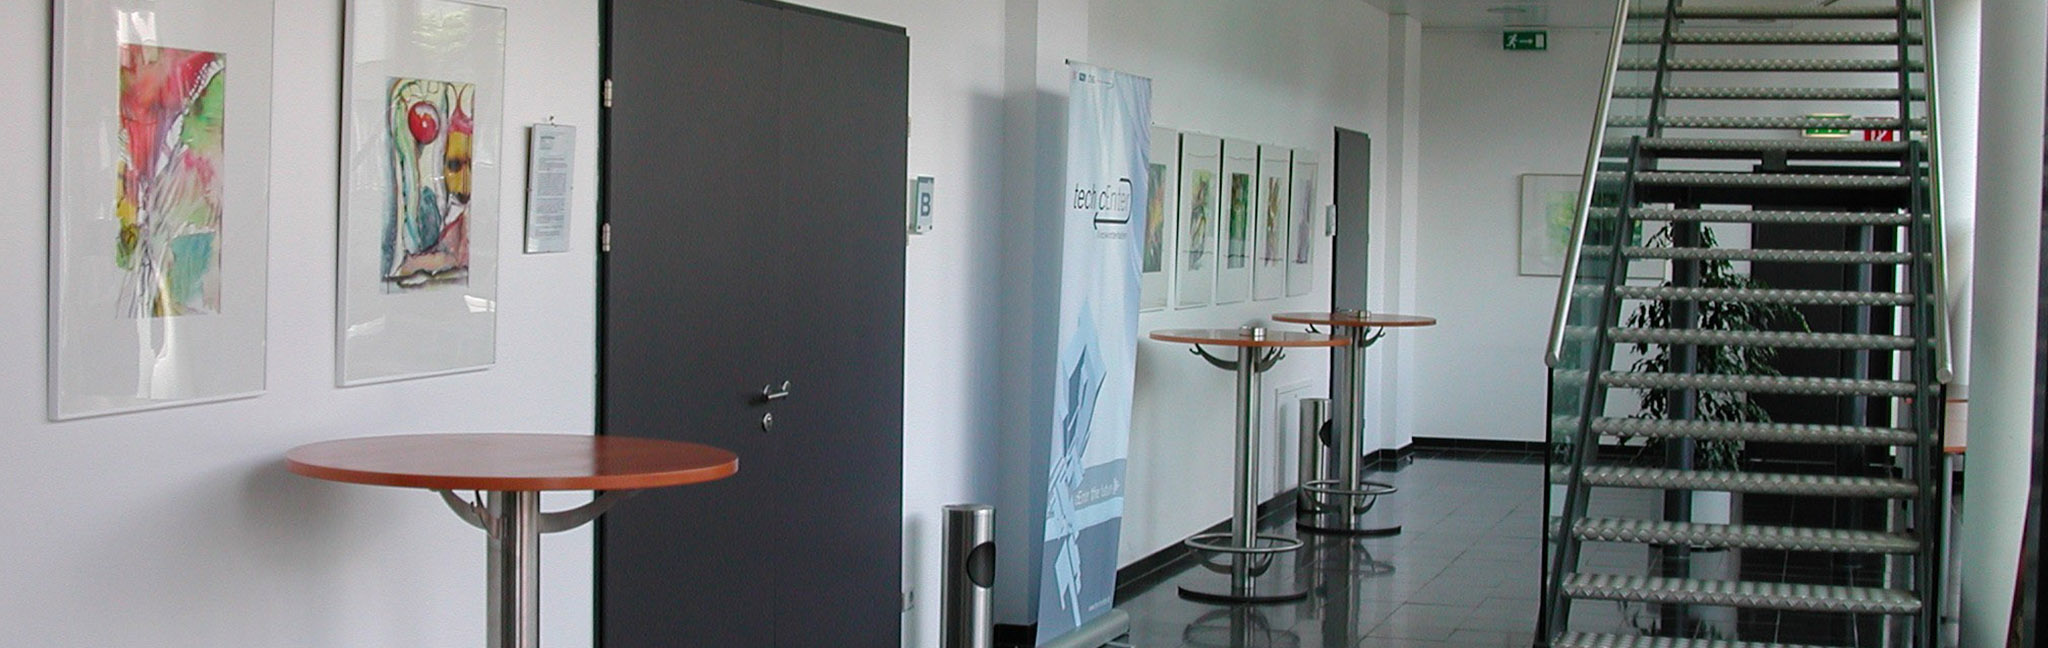 Foyer-Seminarzentrum EG